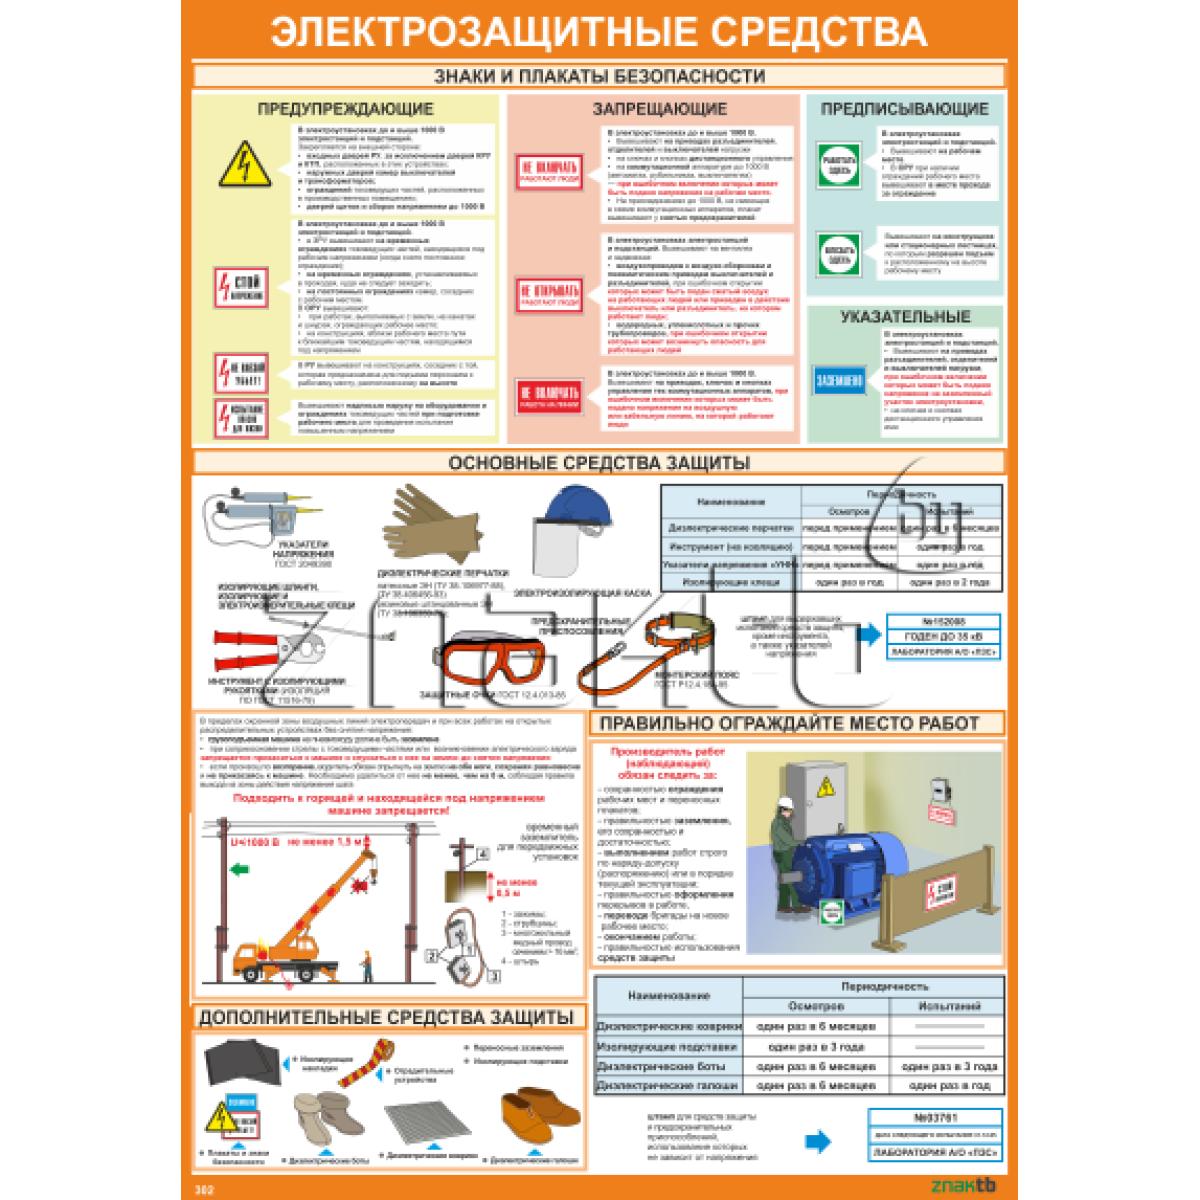 Плакат по охране труда Электрозащитные средства и знаки безопасности